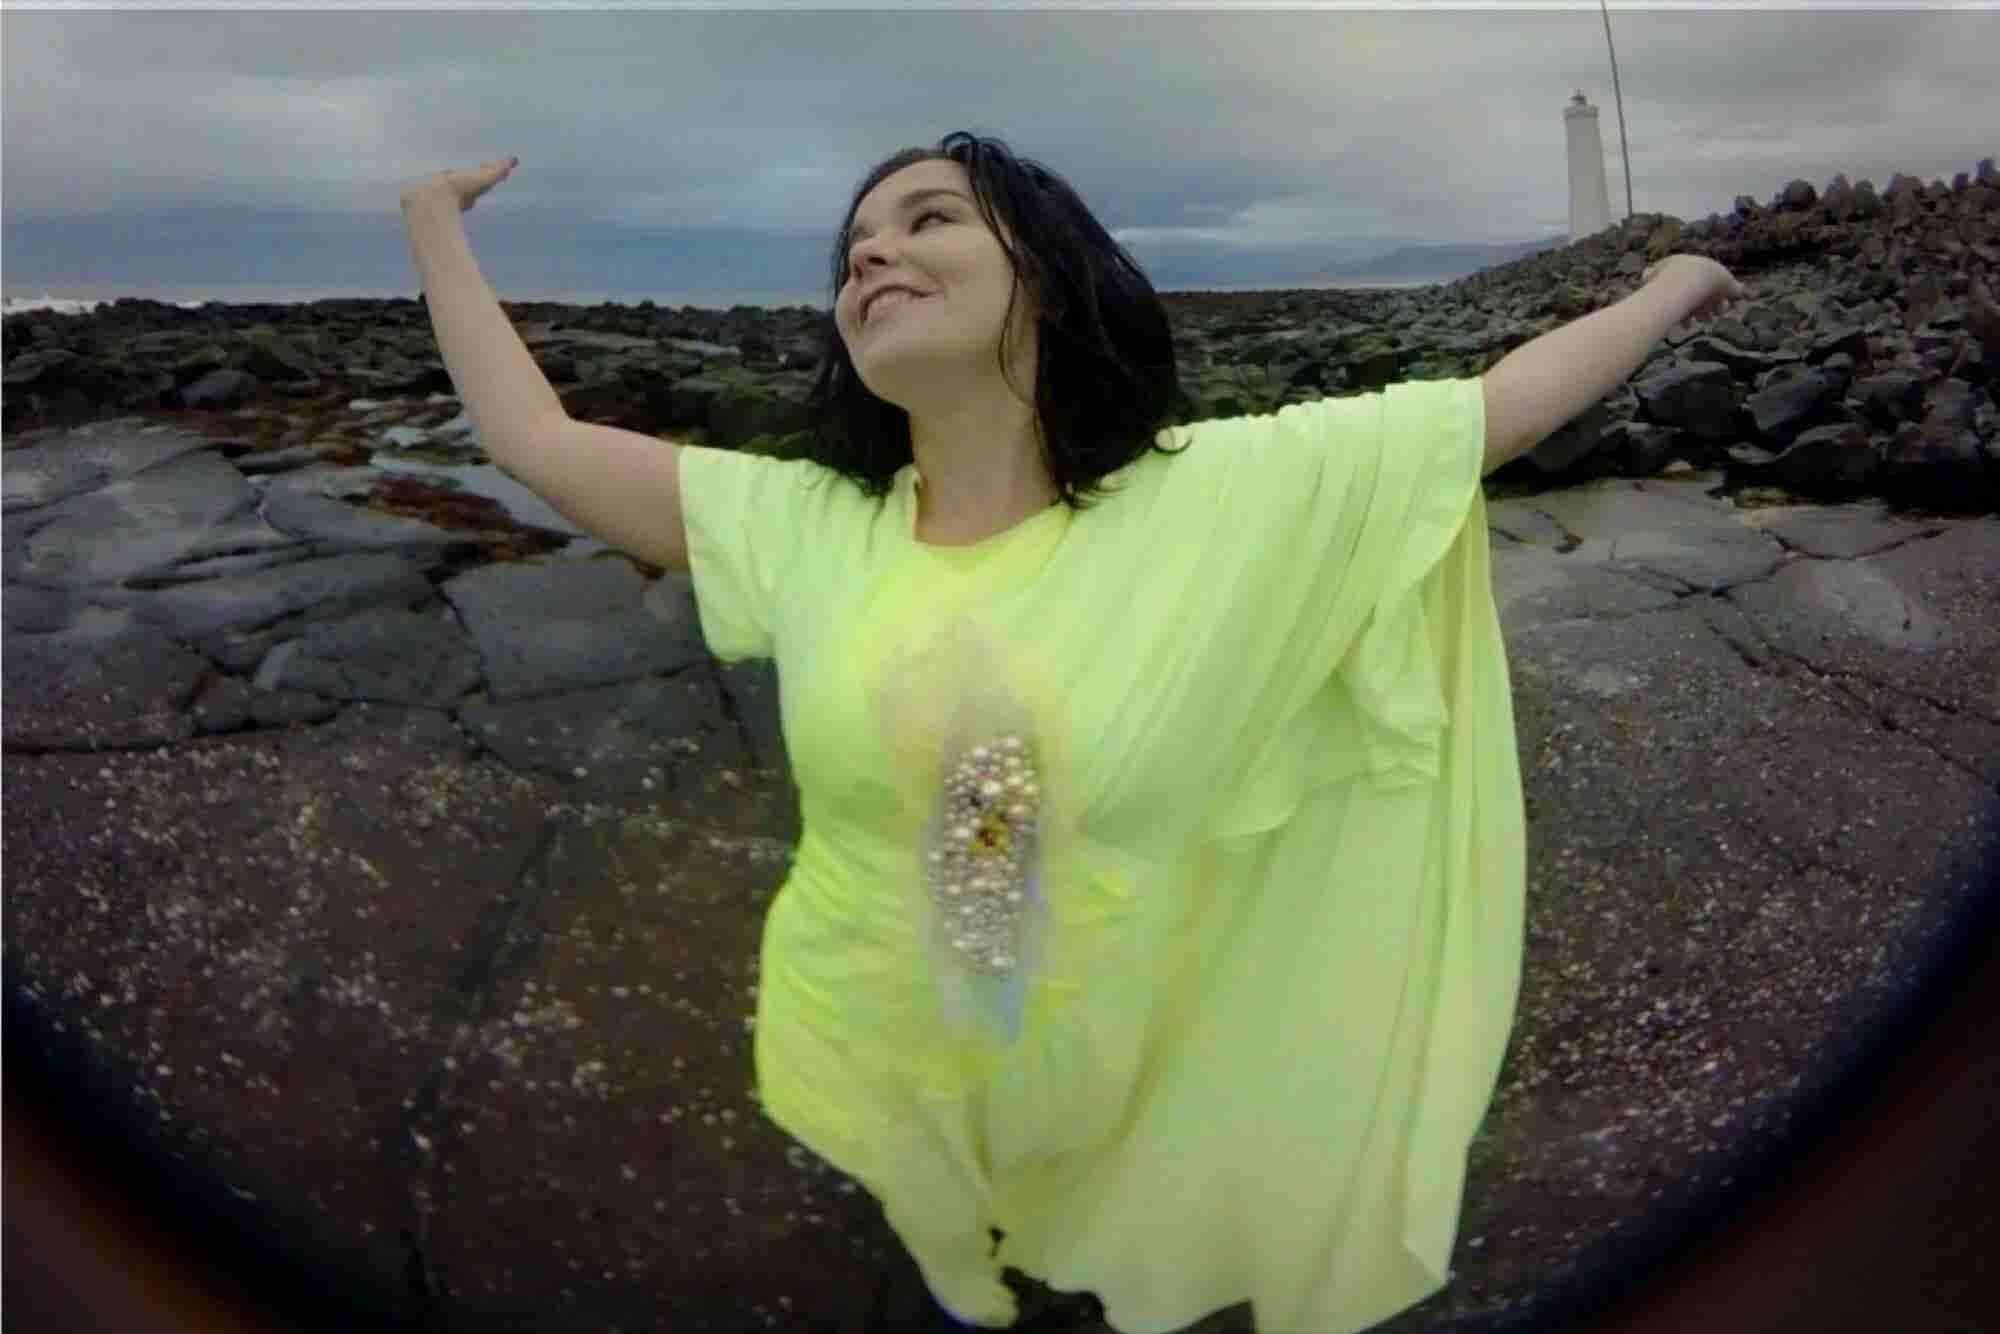 WATCH: Björk's New Music Video Is a Dazzling Harbinger of VR Technolog...